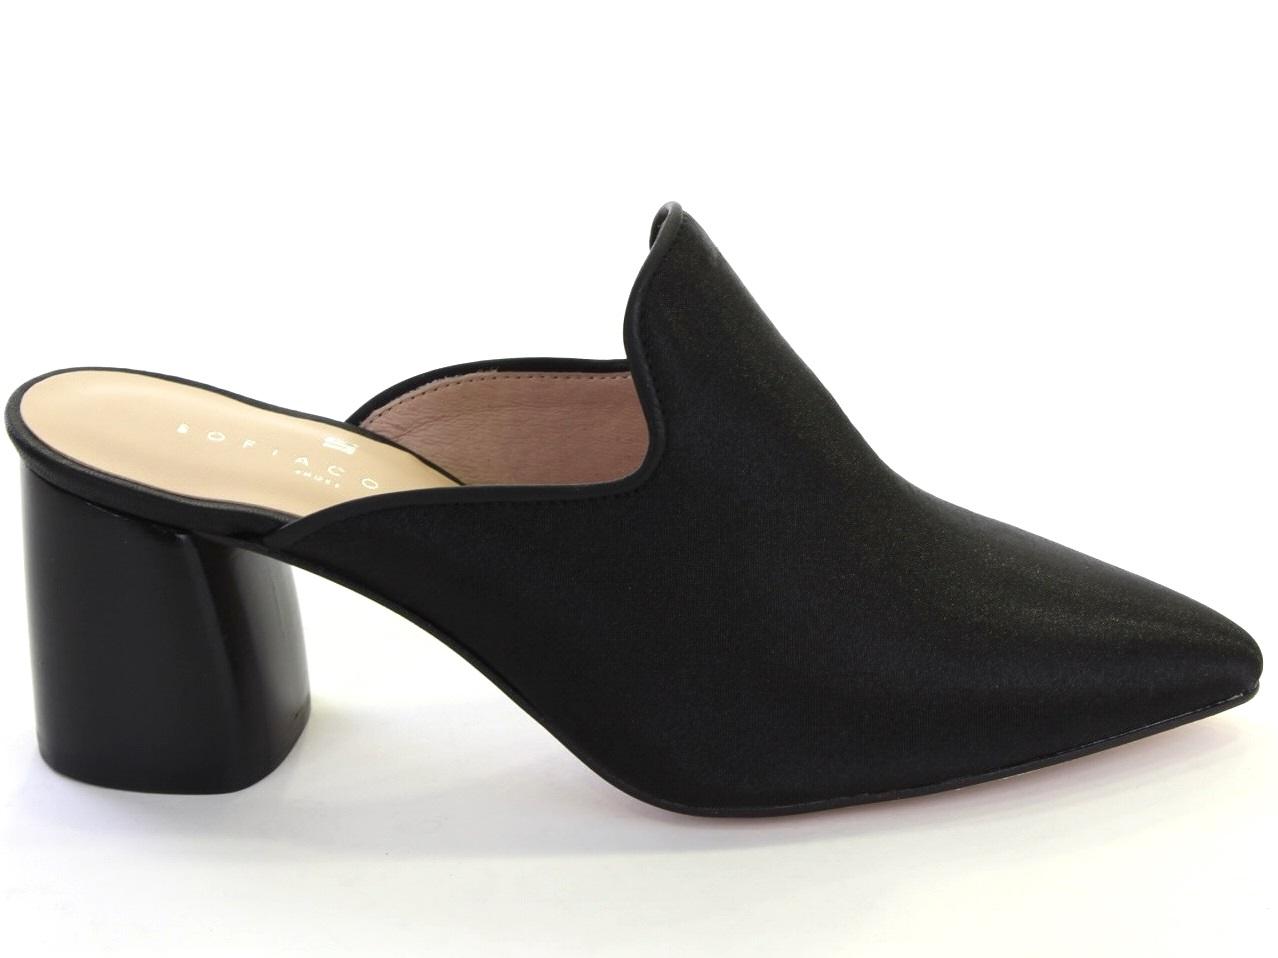 Heel Sandals Sofia Costa - 085 9171 02